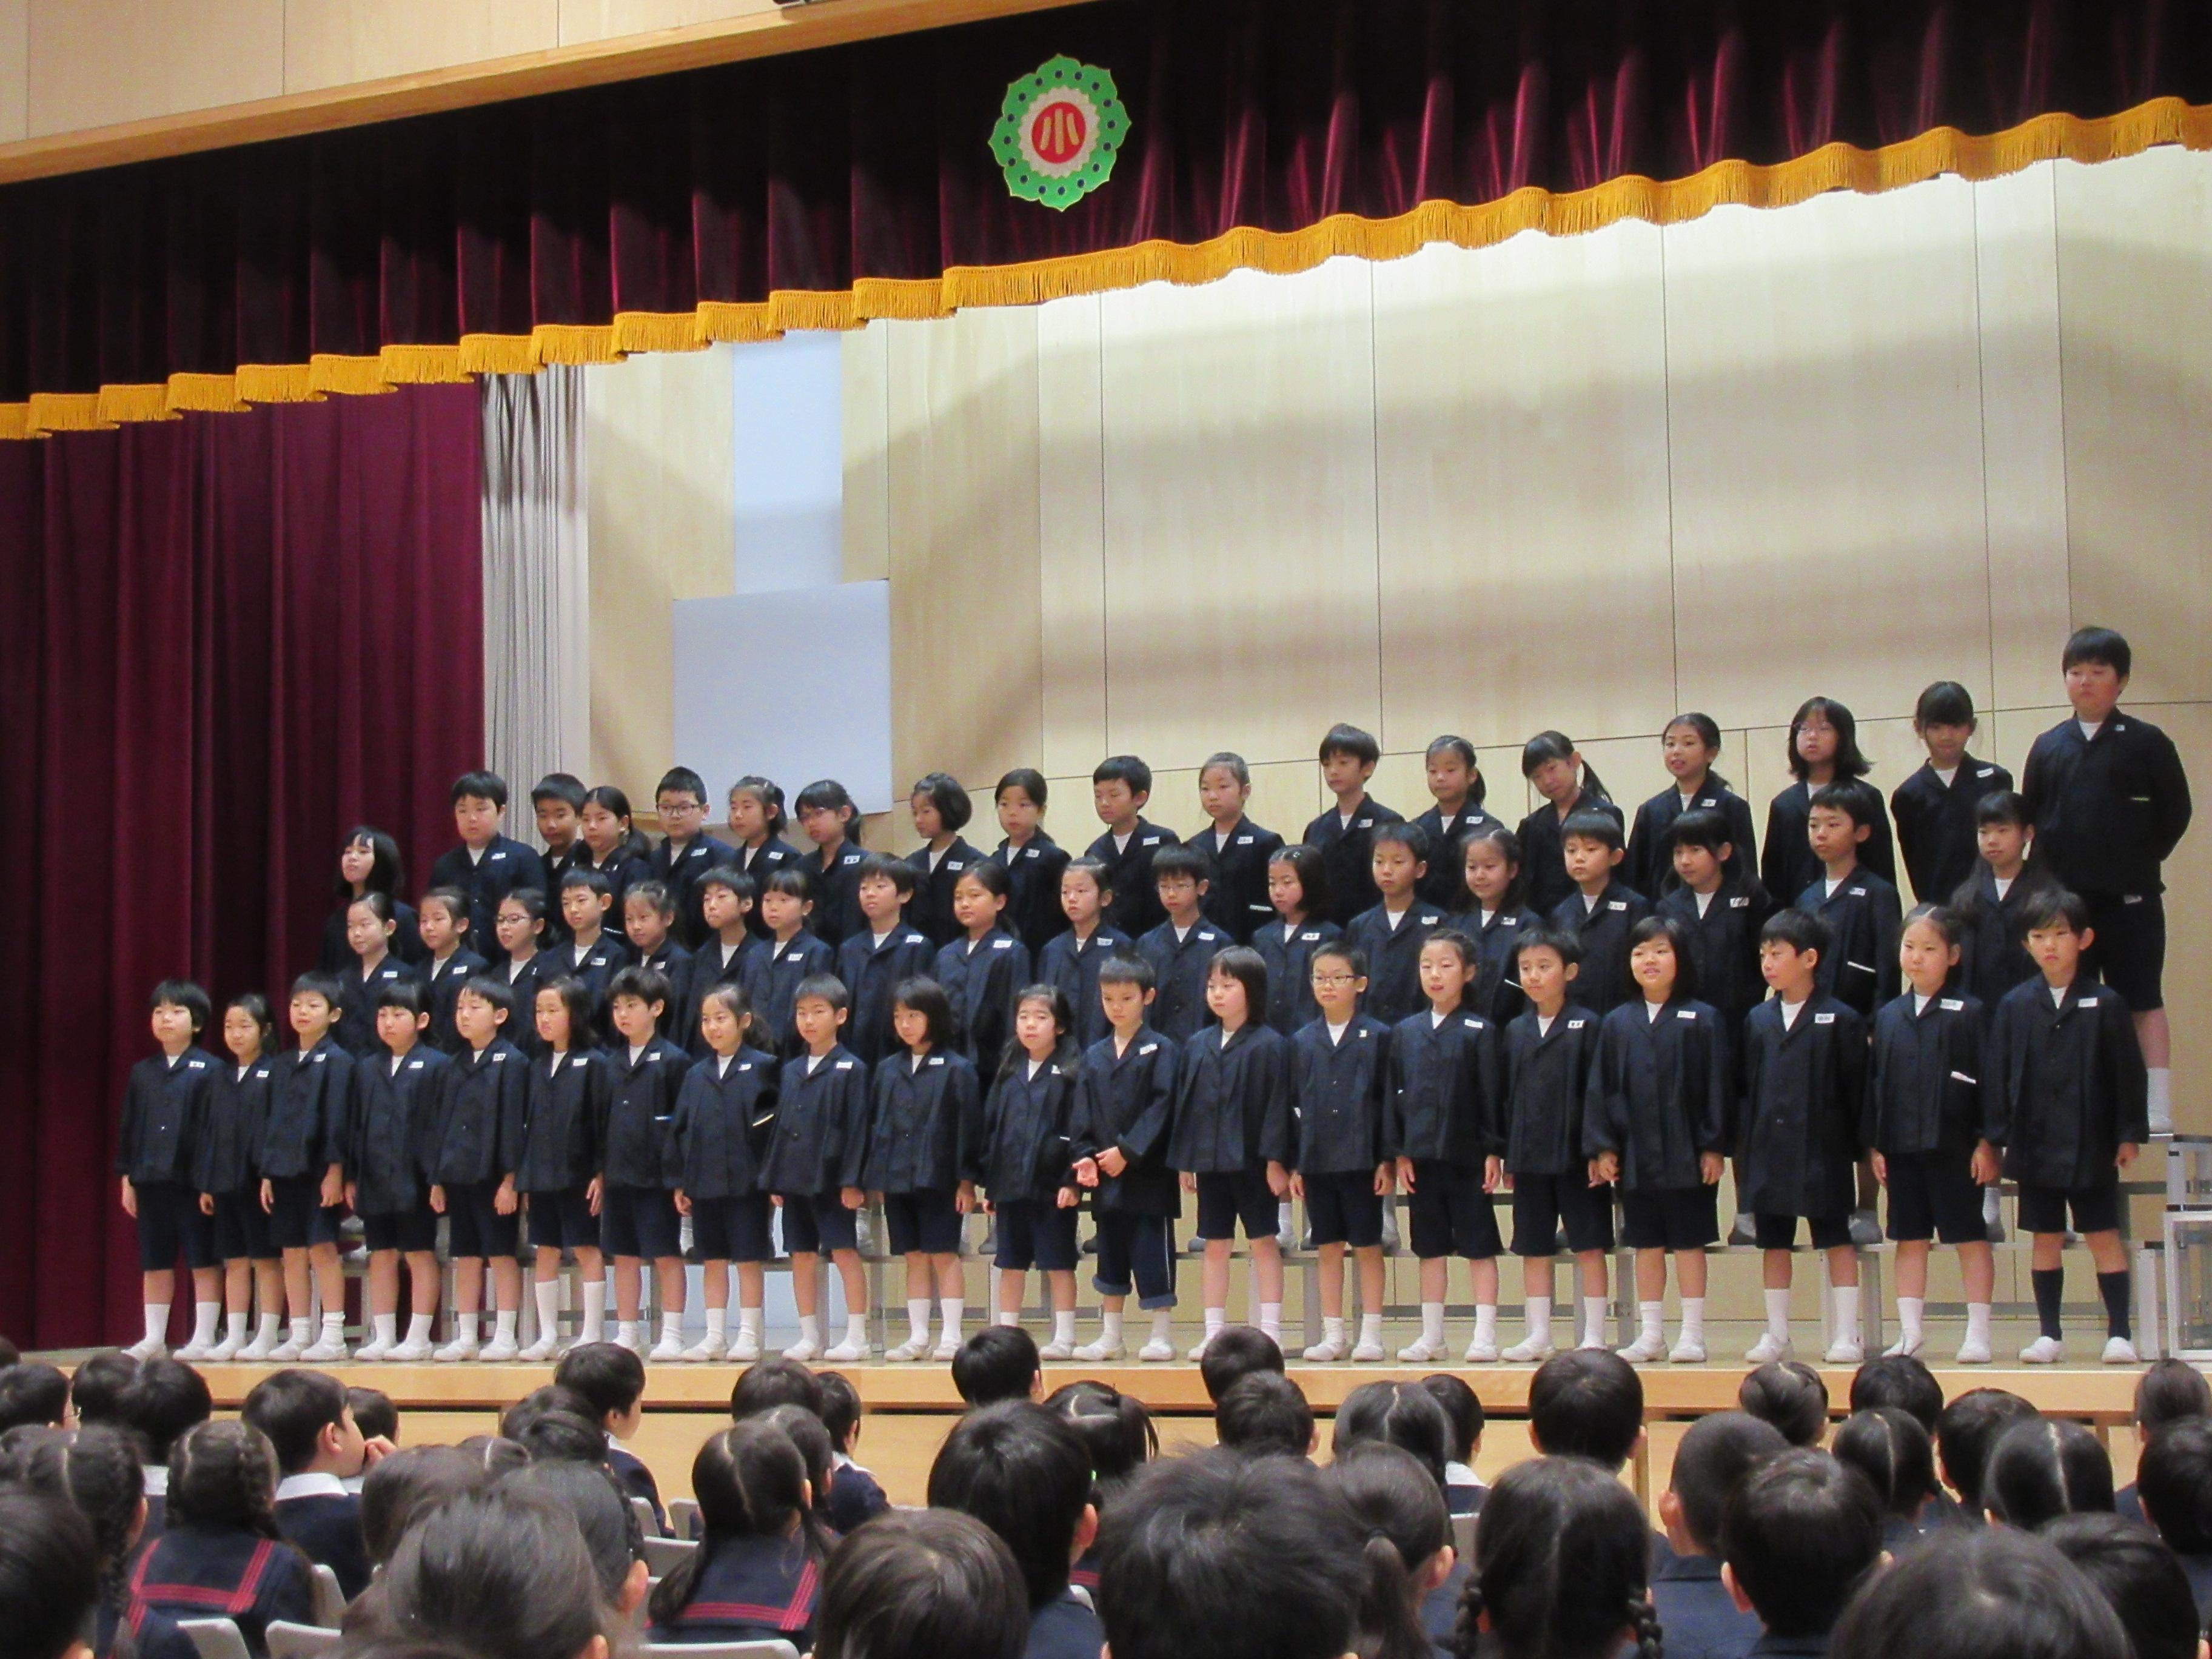 H30 1年生歓迎会サブ2.JPG